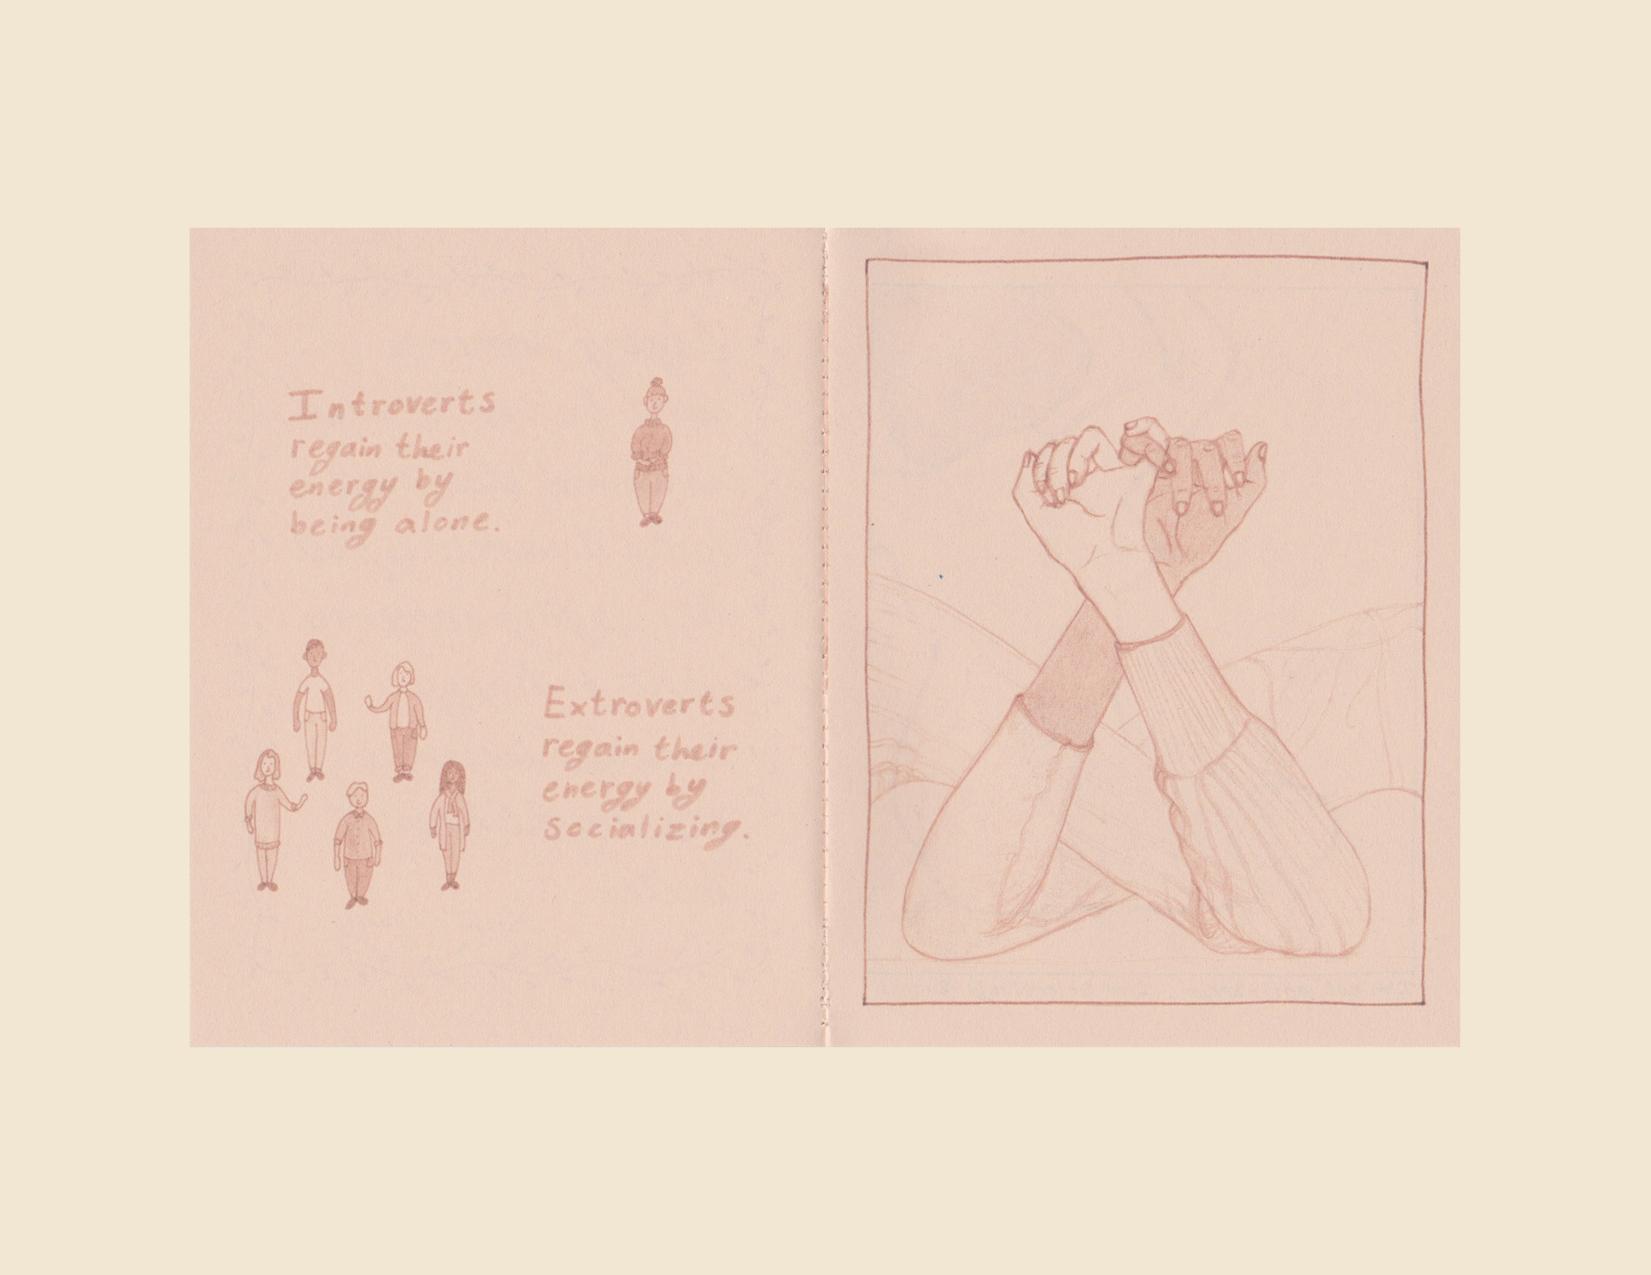 Sensitive Introvert 2 - 2